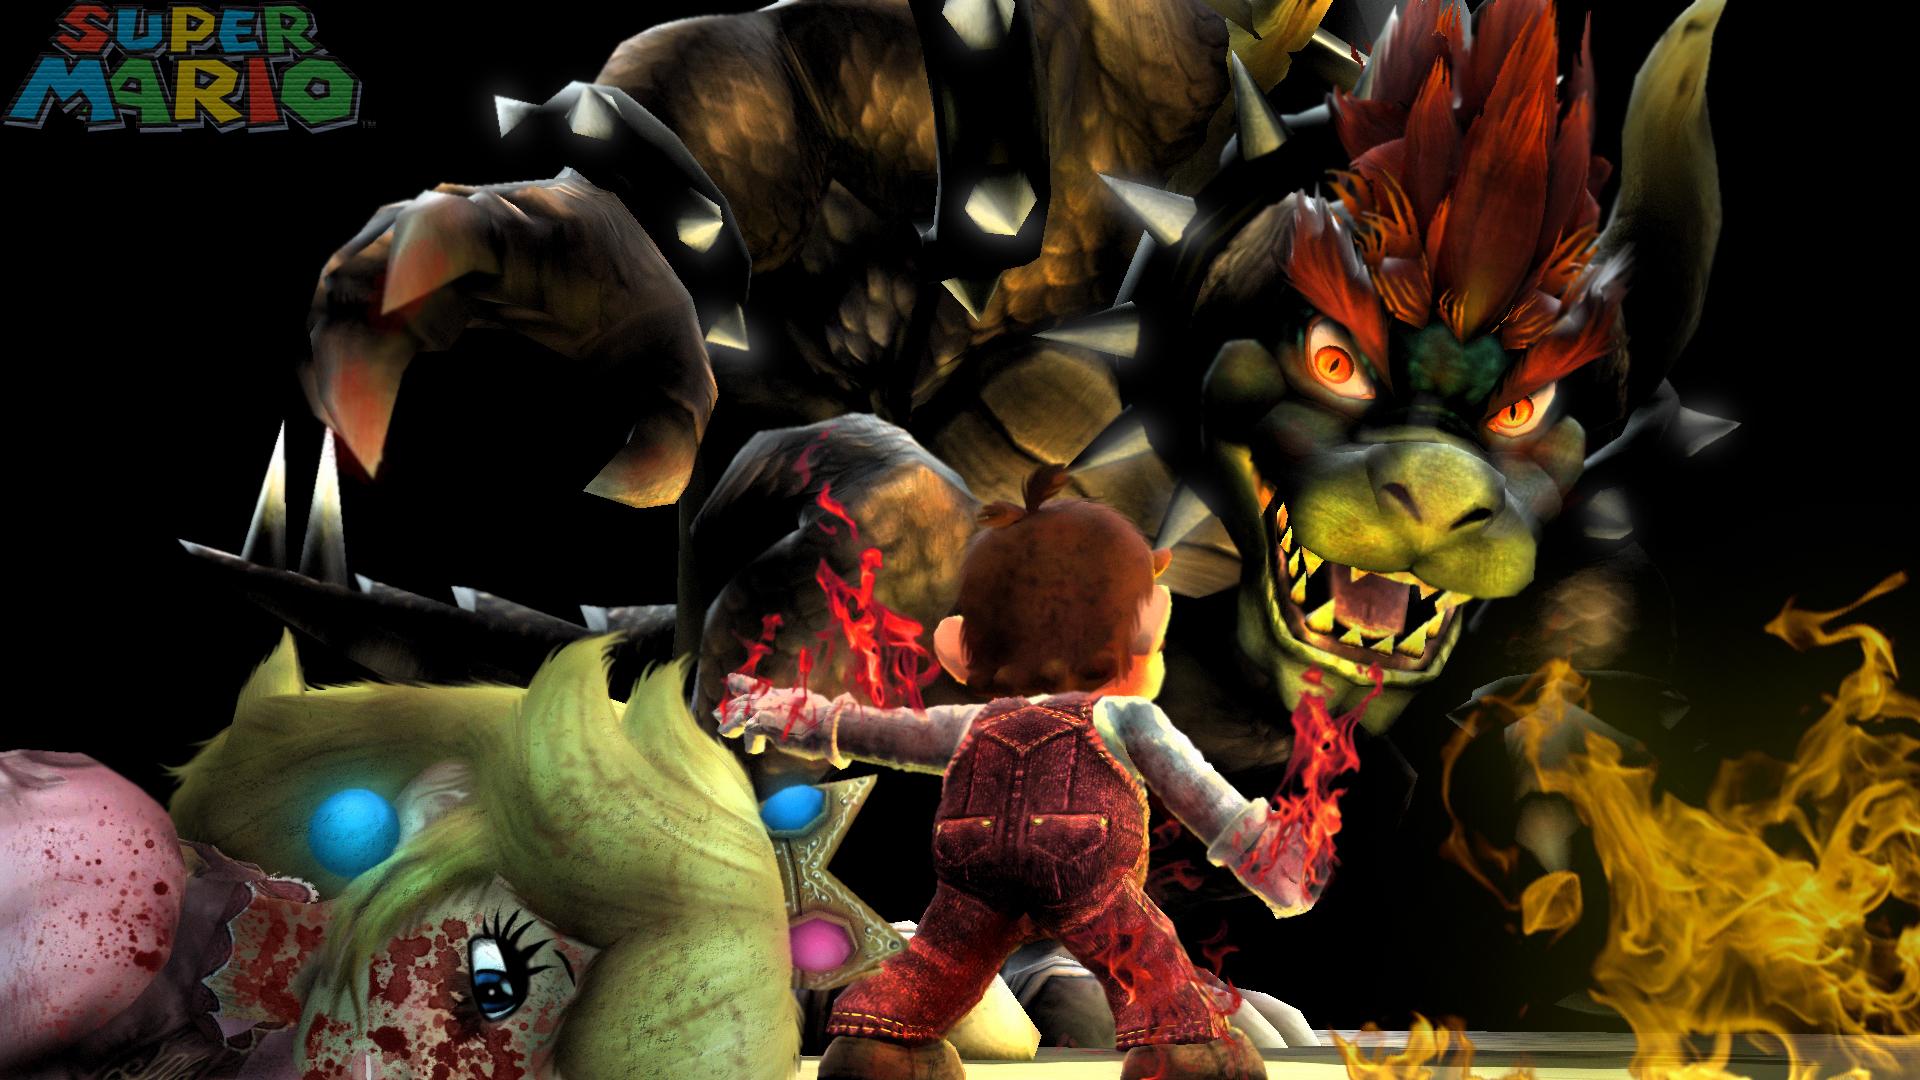 Mario VS Giga Bowser by LemurfotArt on DeviantArt